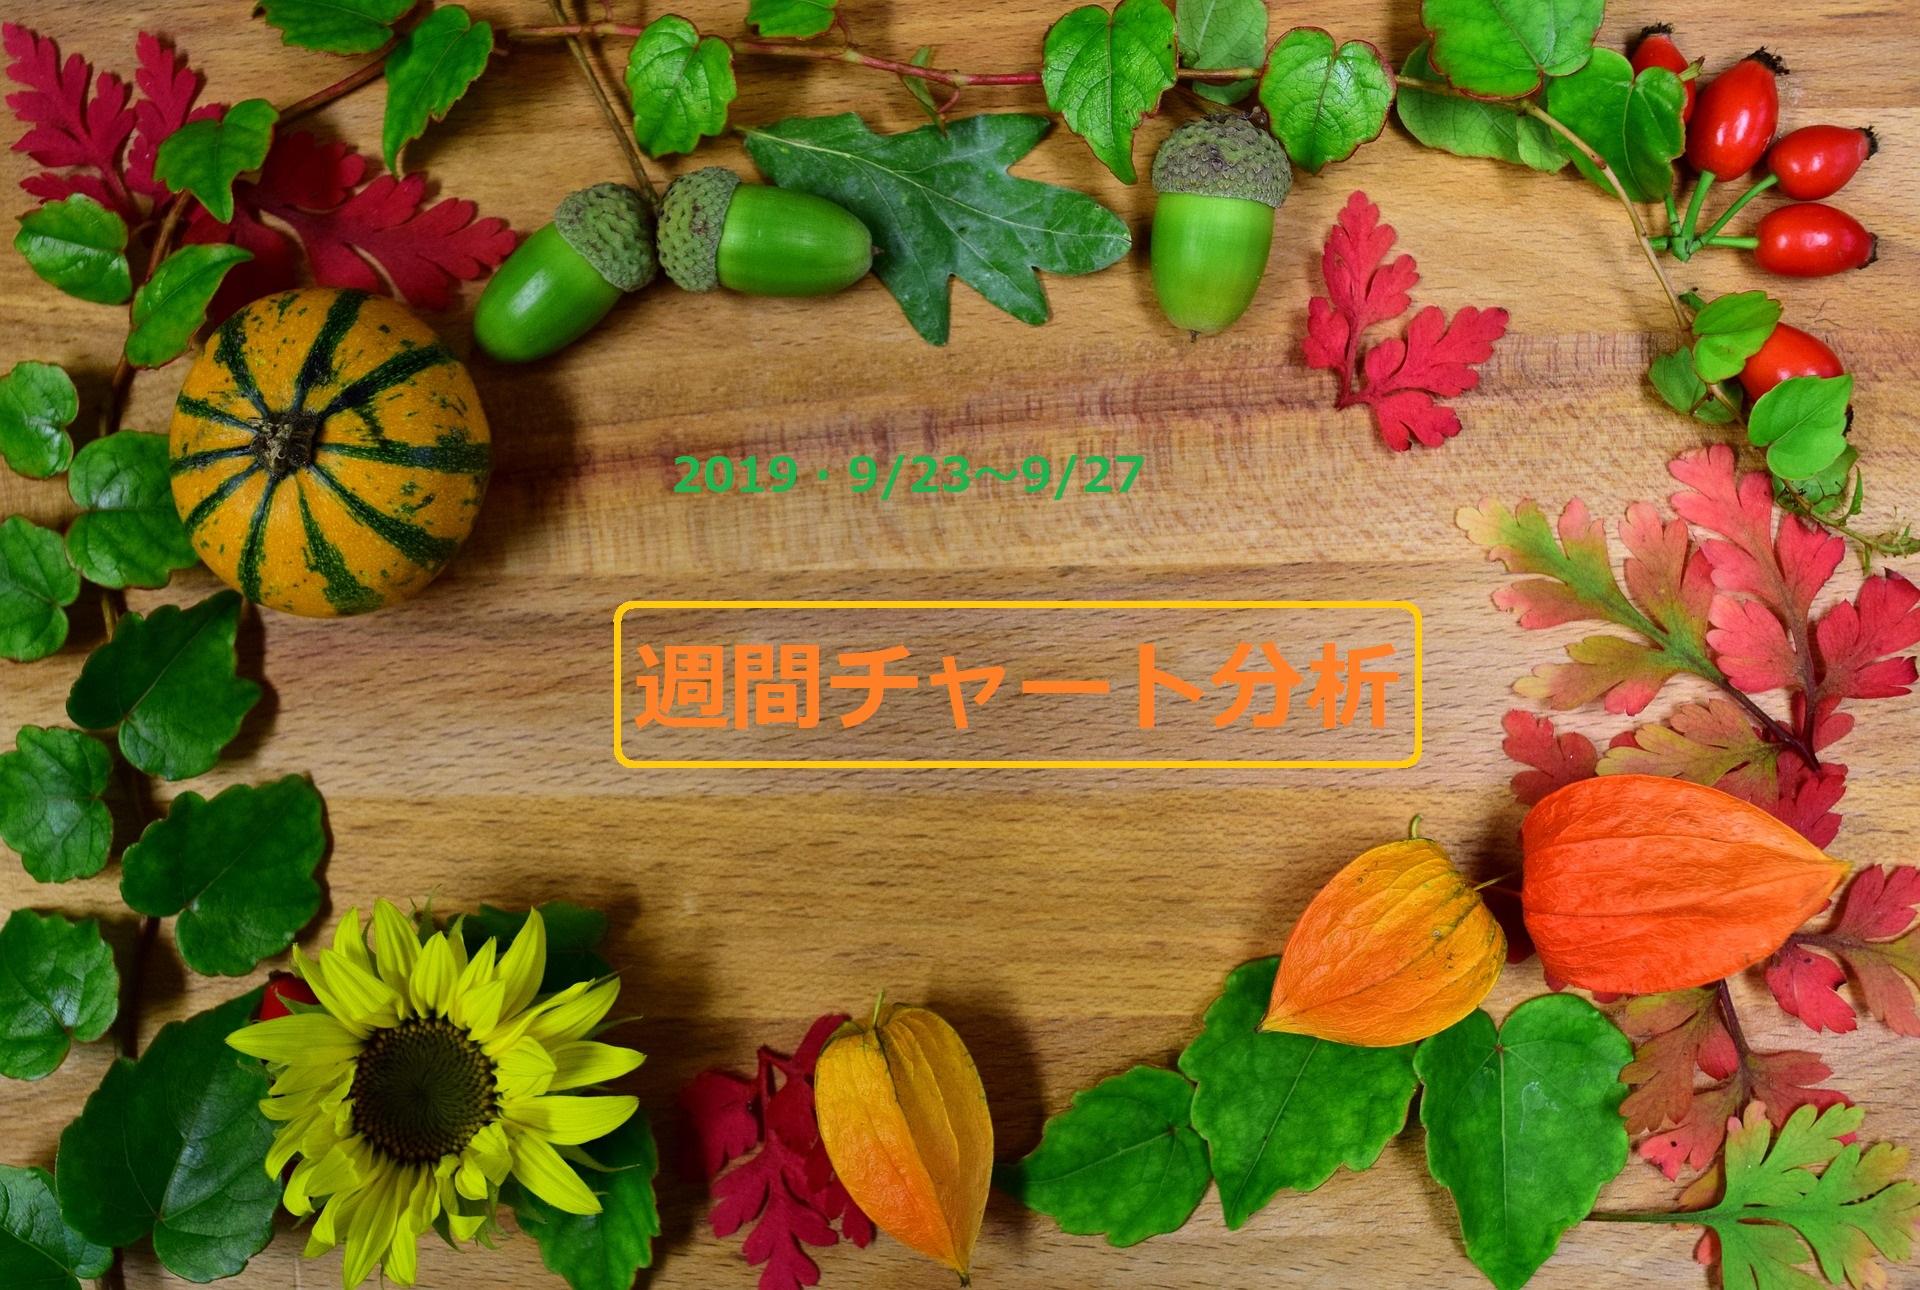 【FX】週間チャート分析・ドル円【2019・9/23~9/27】